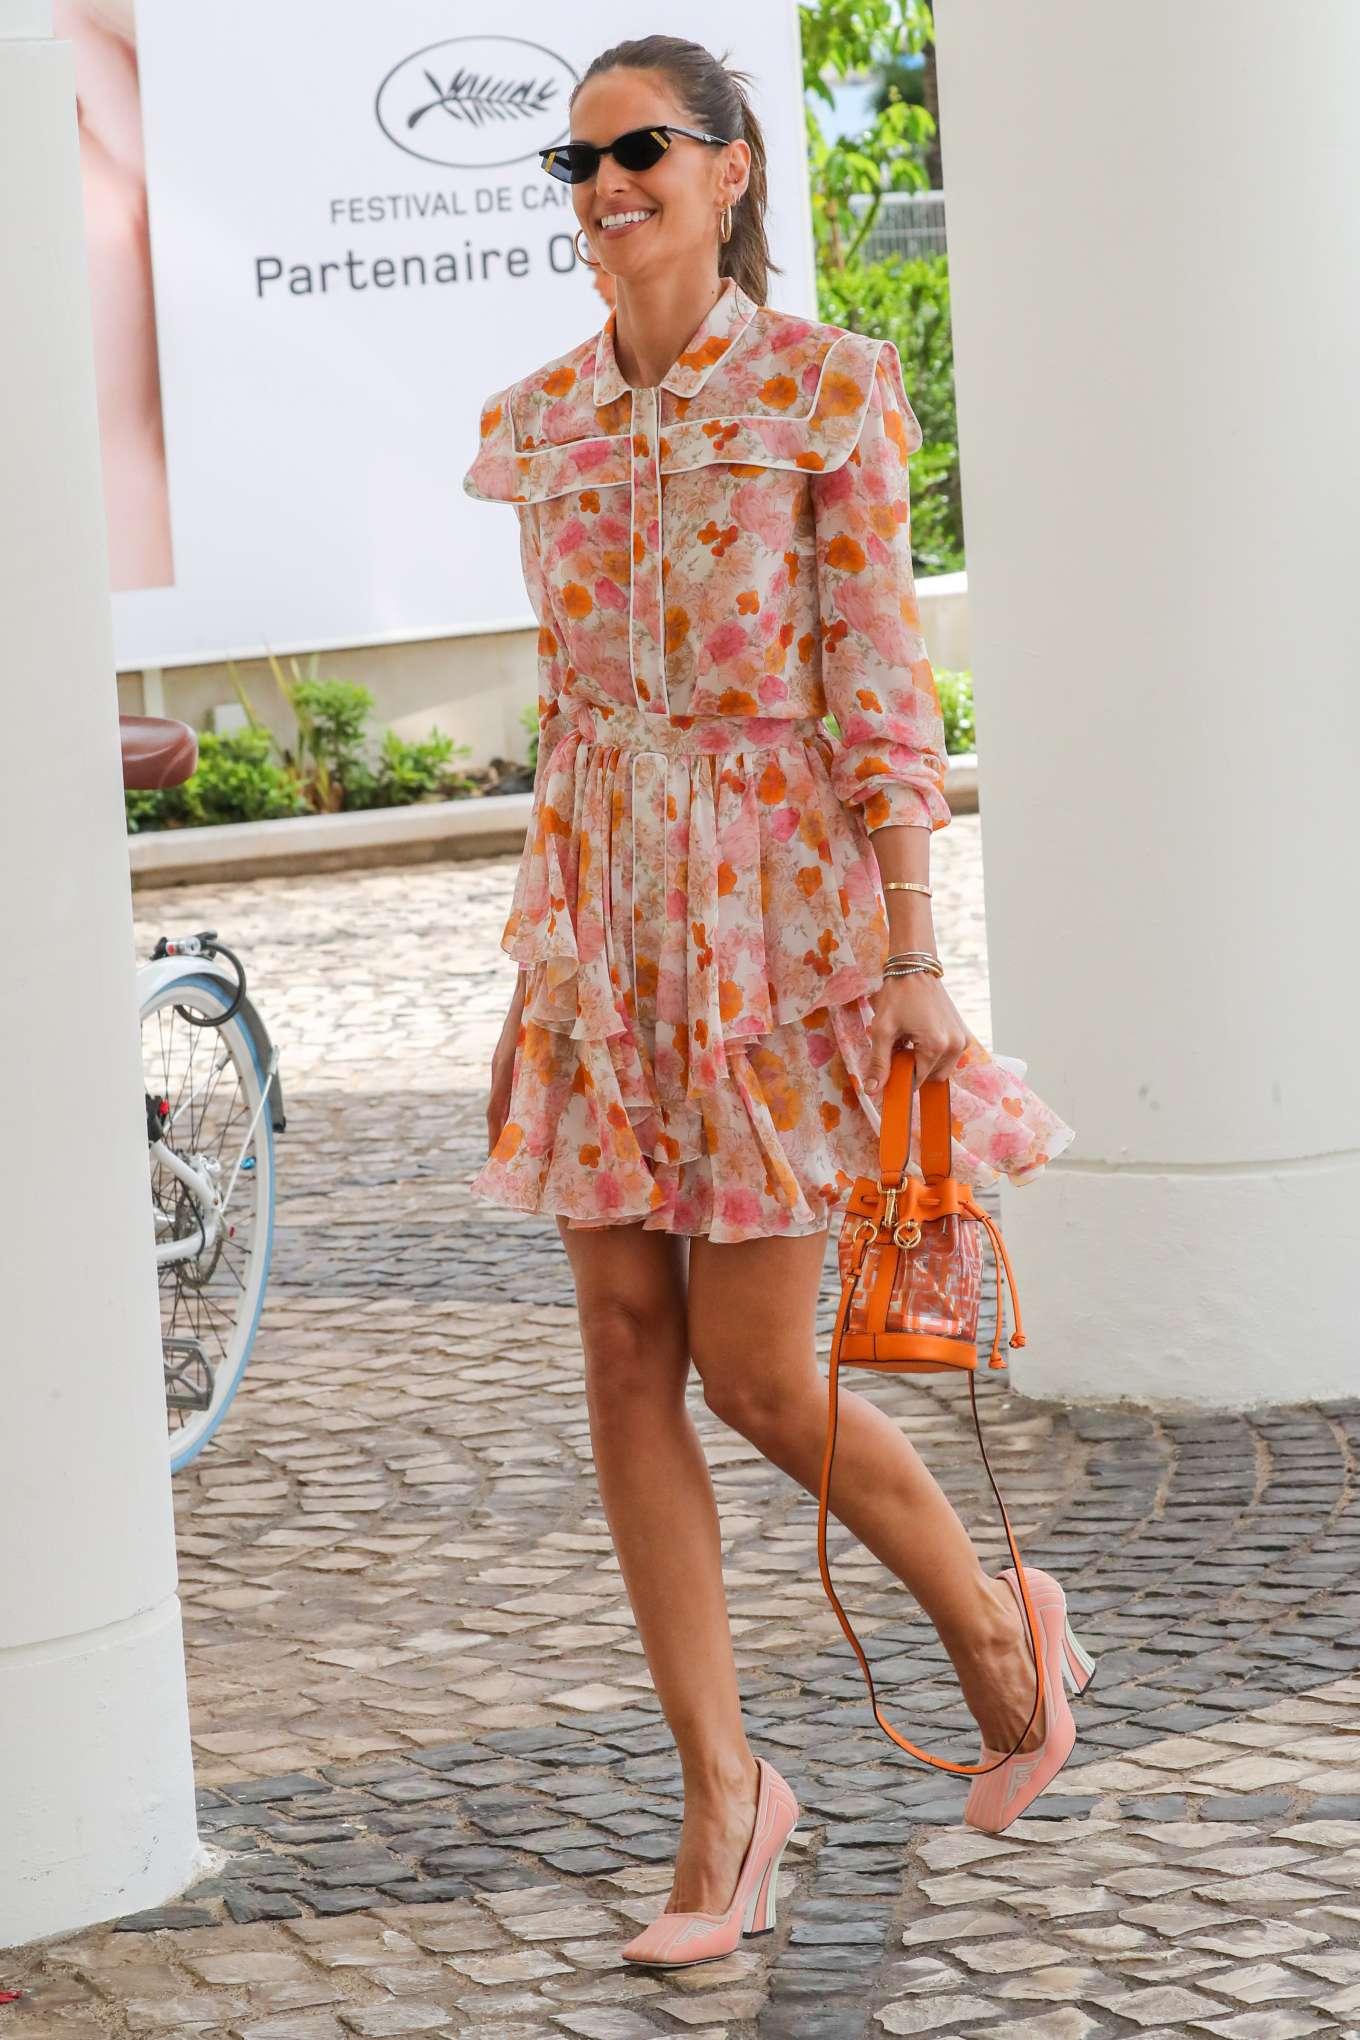 Izabel Goulart 2019 : Izabel Goulart in Floral Print Dress at the Martinez Hotel-05